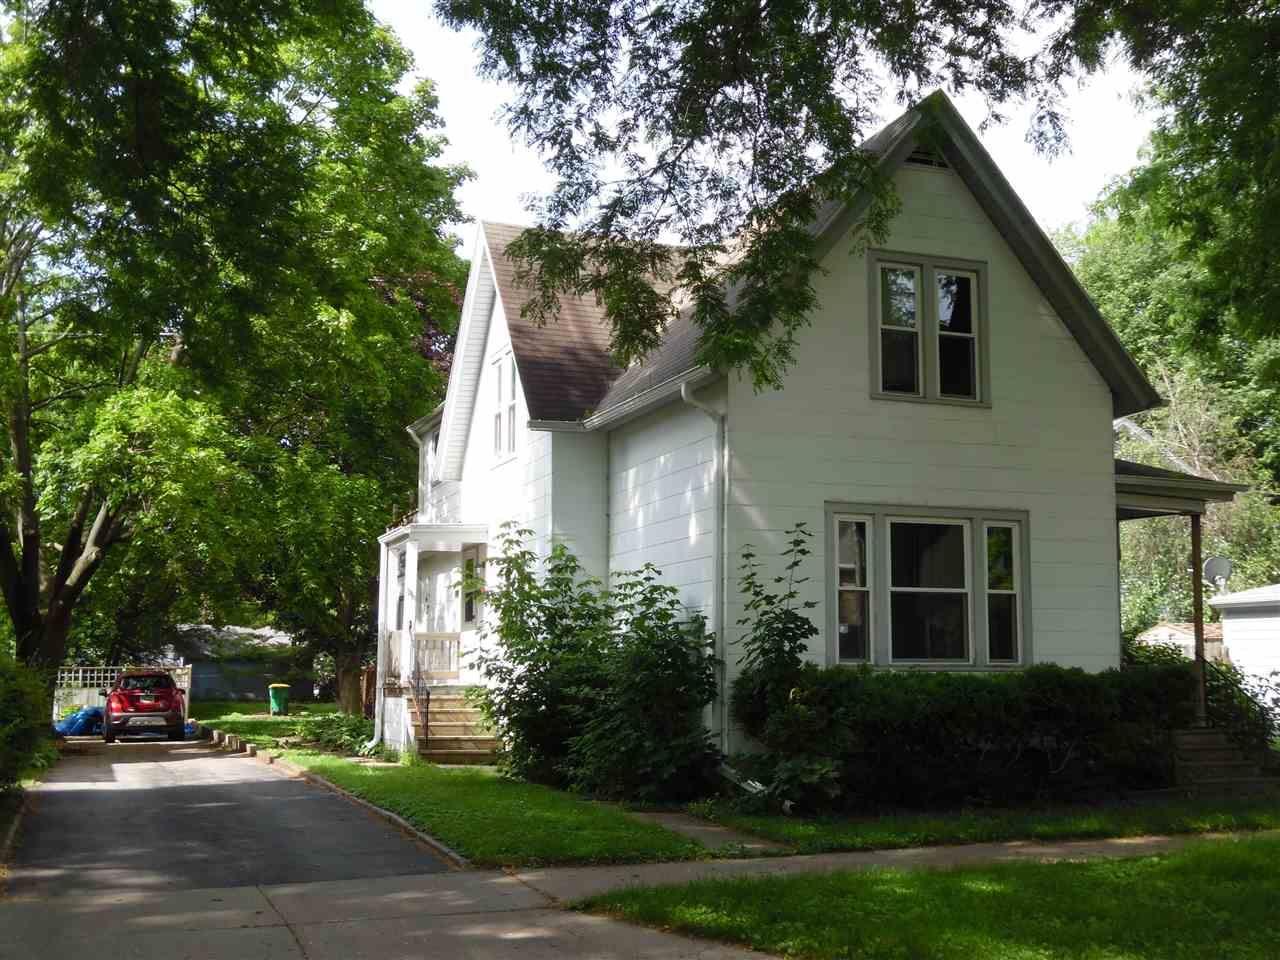 1208 LAWE Street, Green Bay, WI 54301 - MLS#: 50225790